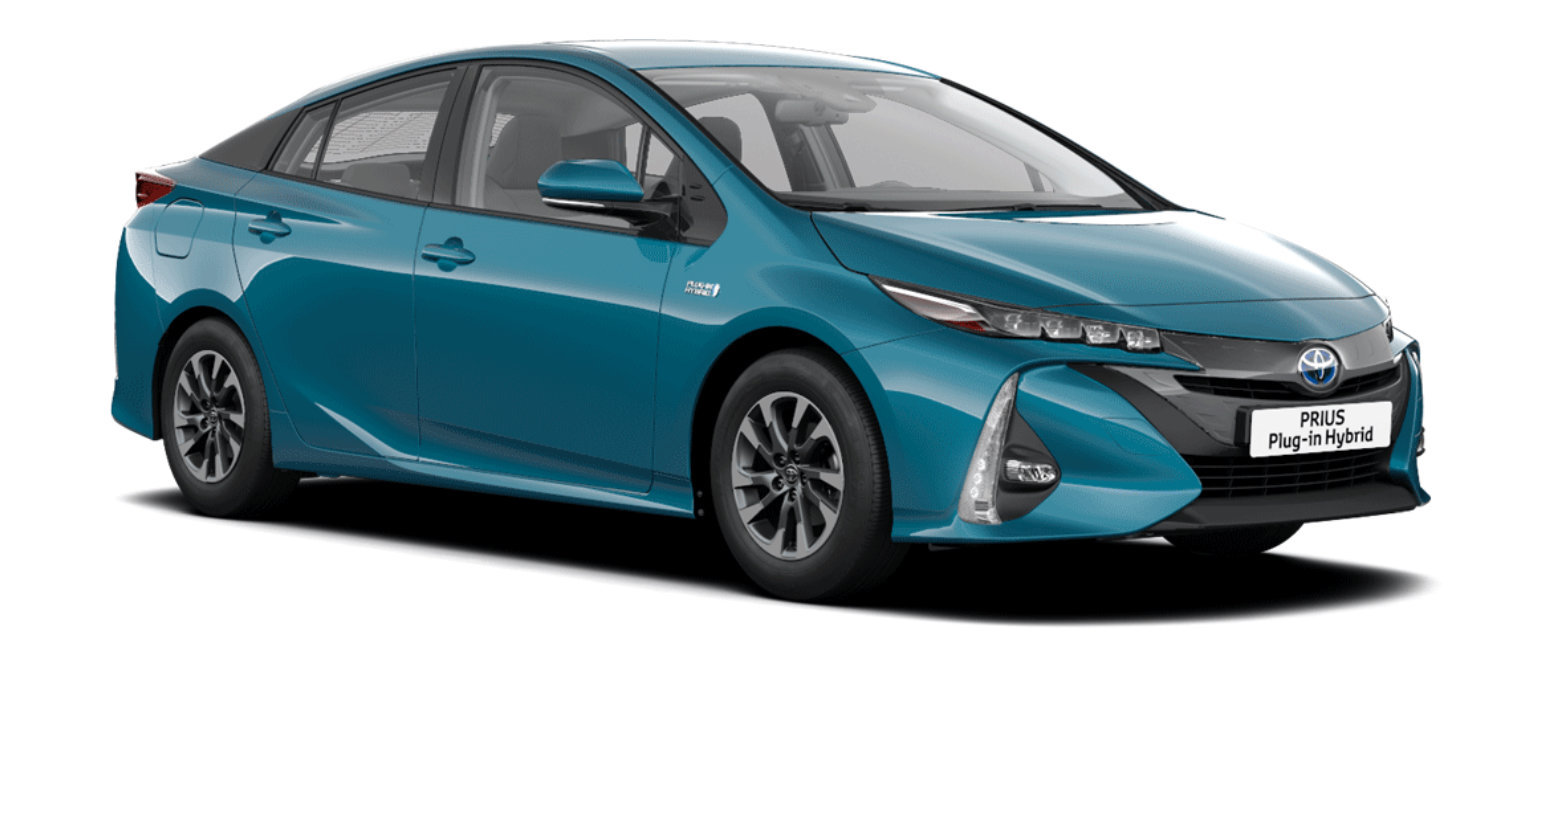 Toyota Konfigurator